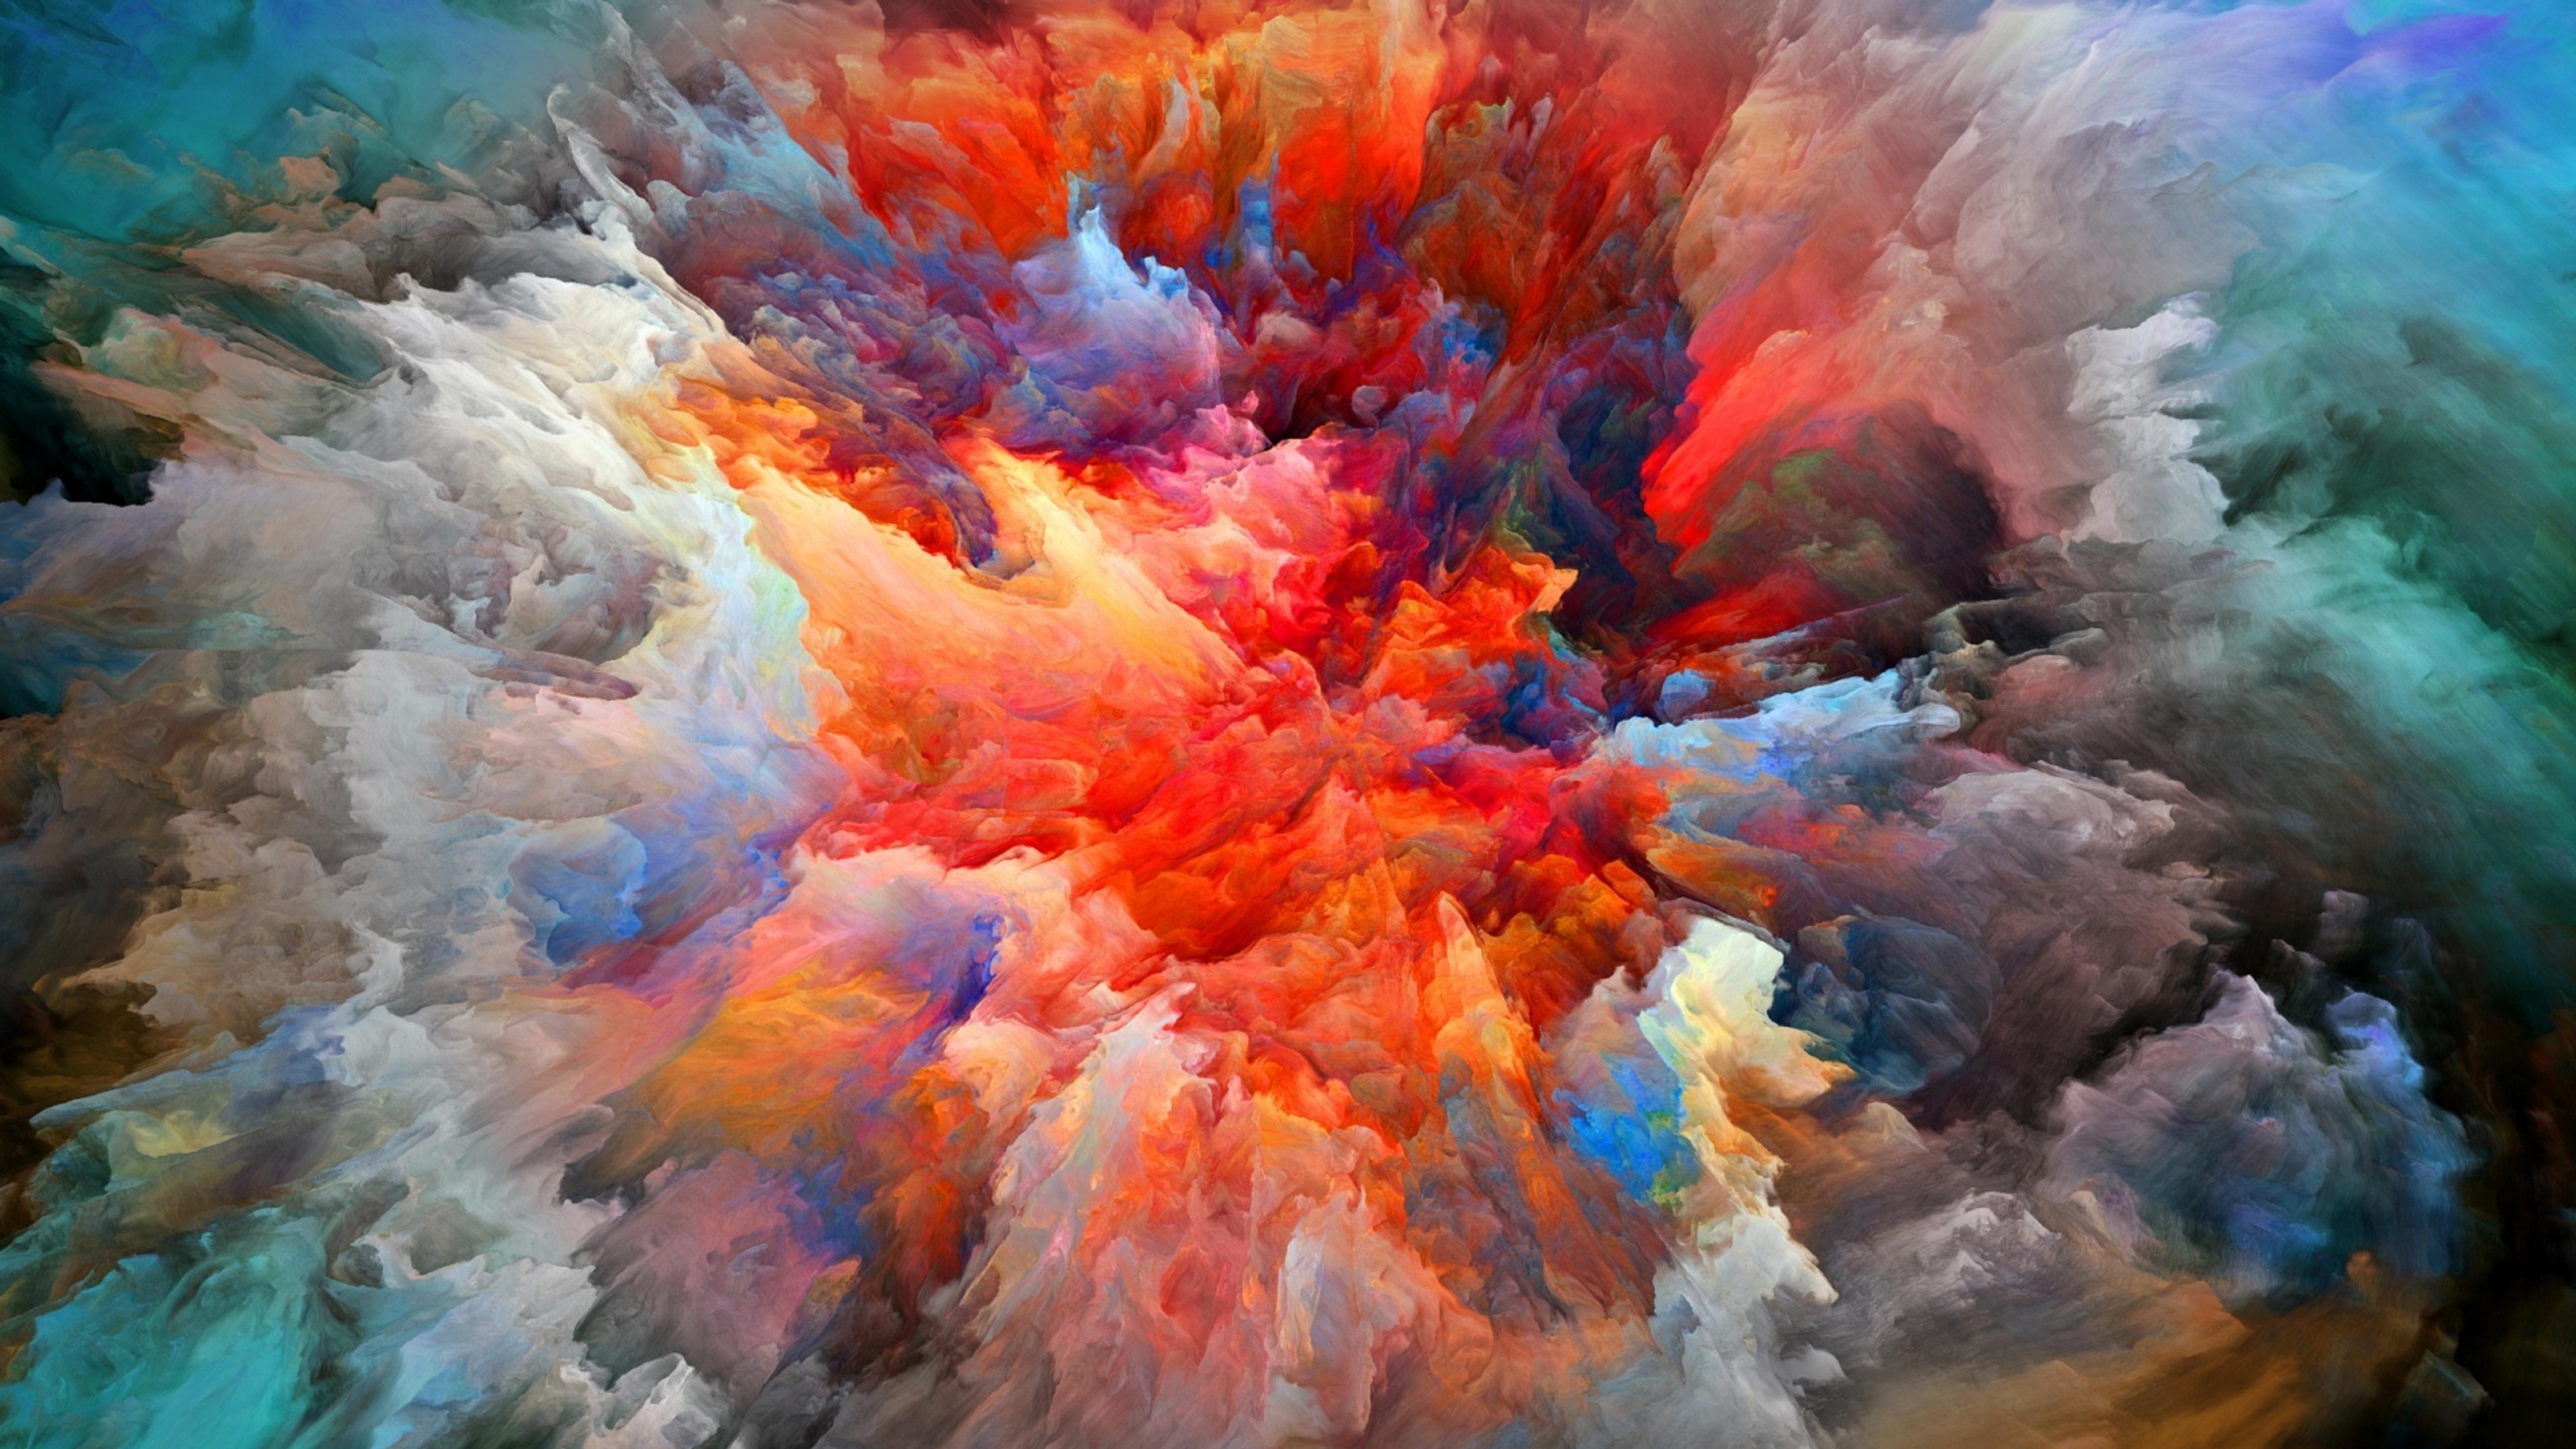 explosion of colors - hd wallpaper wallpaper download 5120x2880